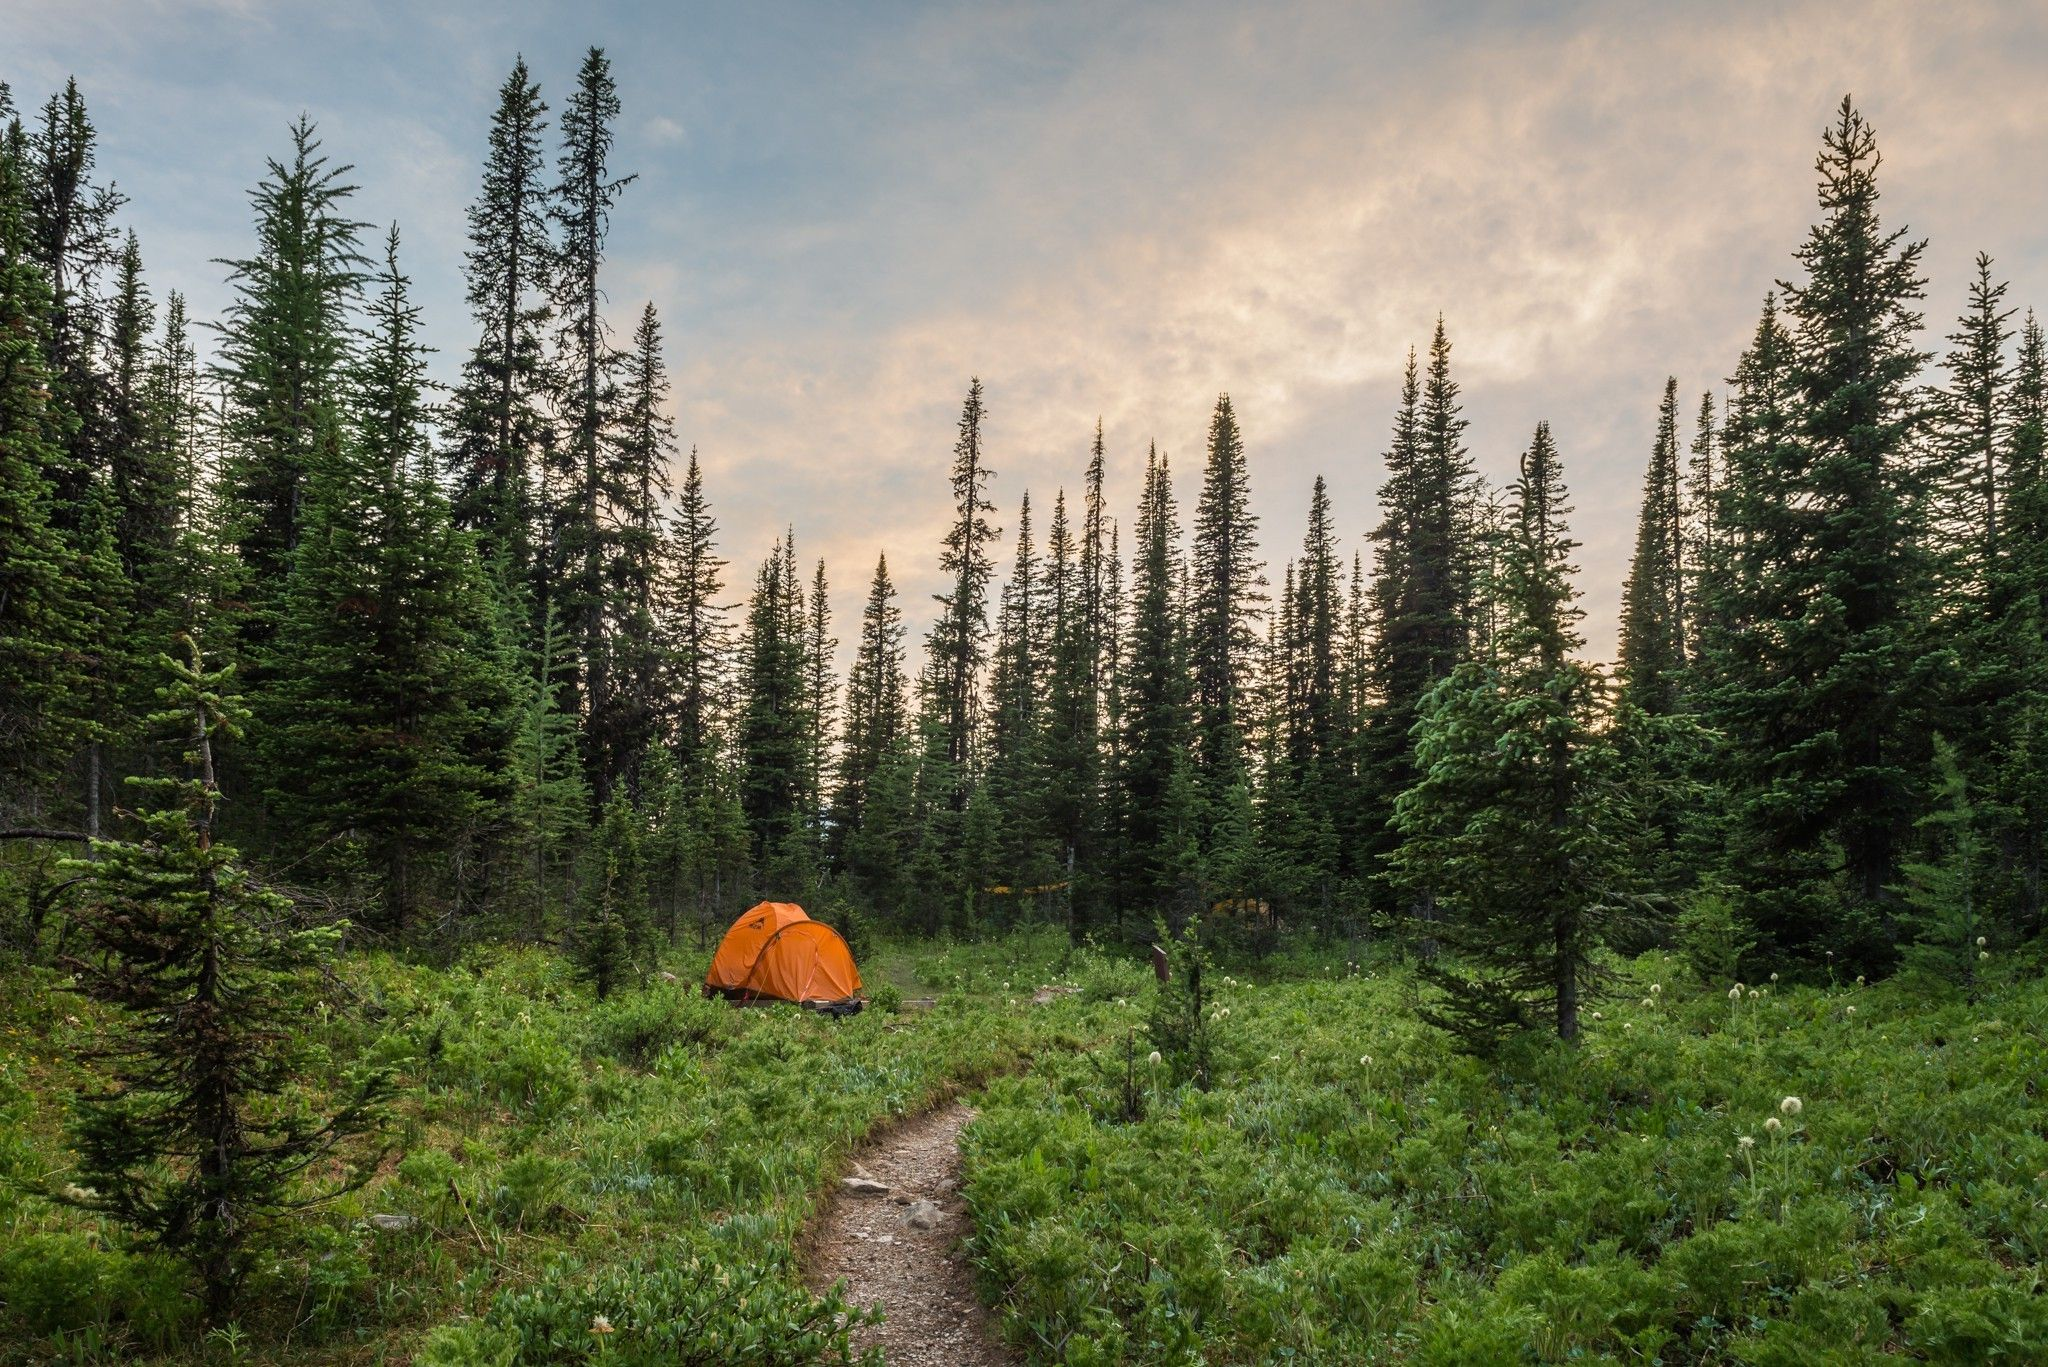 Landscape Plants Trees Camping Green Nature Tents Path Wallpaper